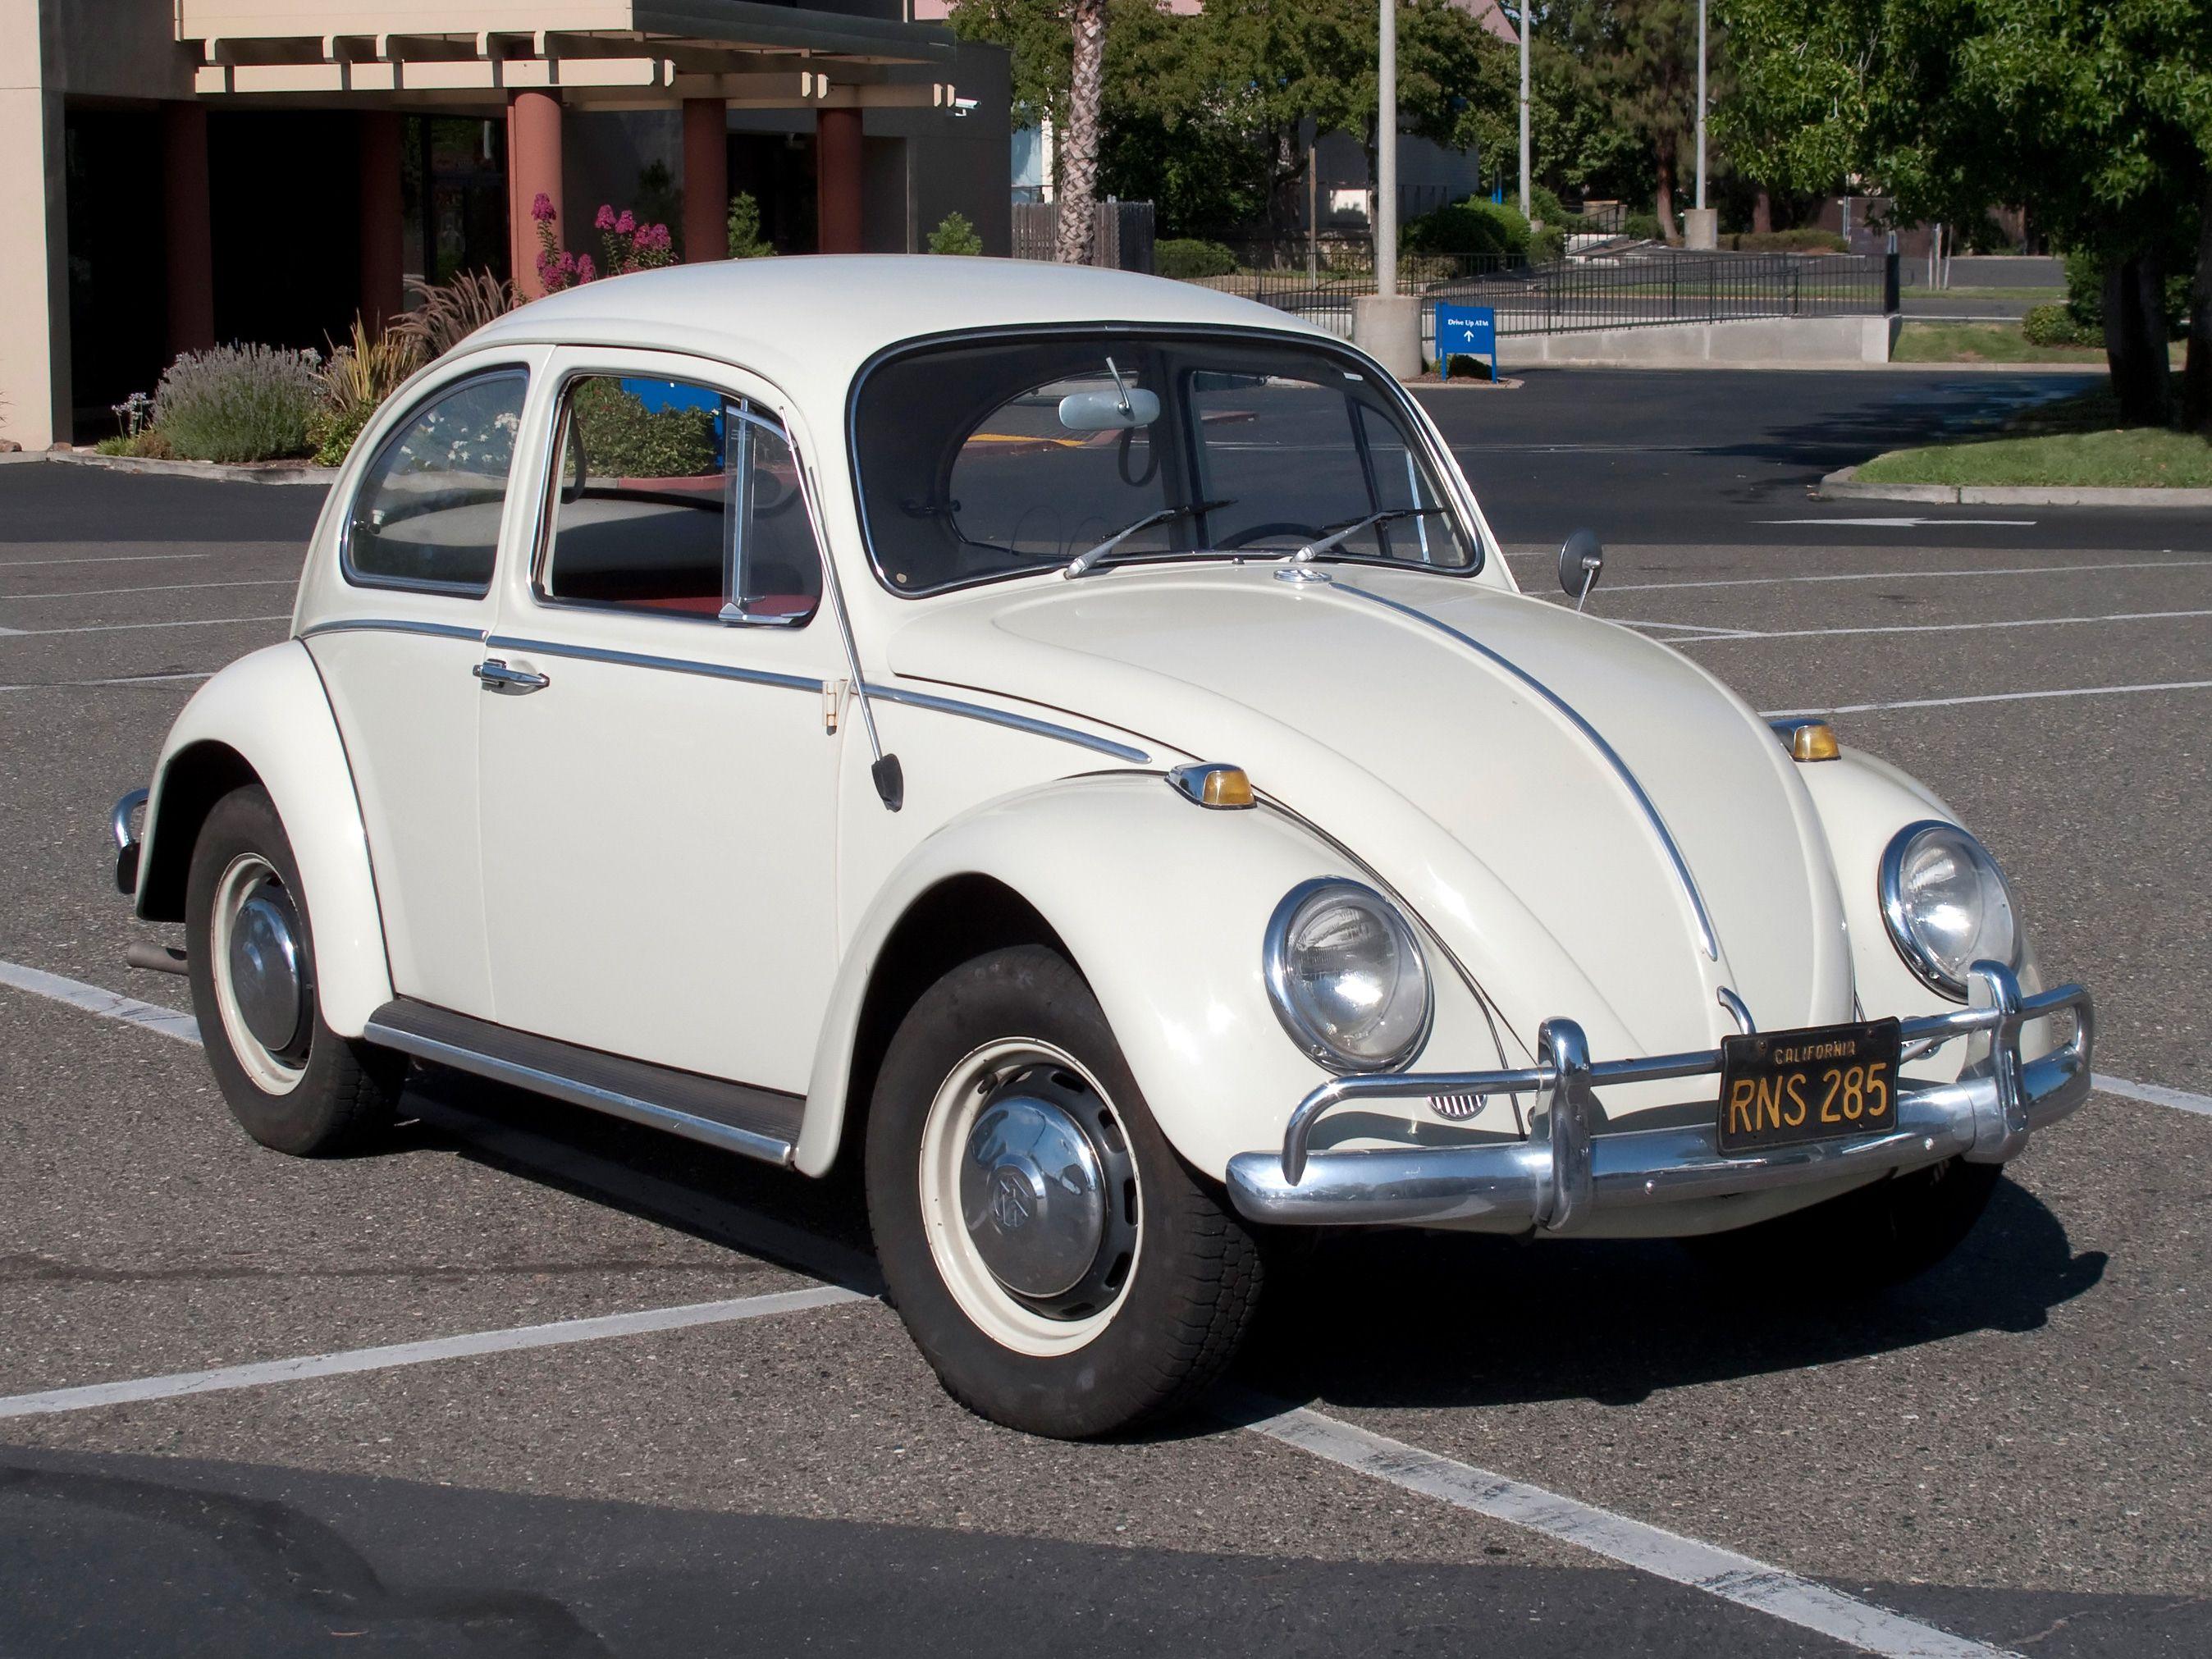 Image from https://upload.wikimedia.org/wikipedia/commons/8/88/VolkswagenBeetle-001.jpg.